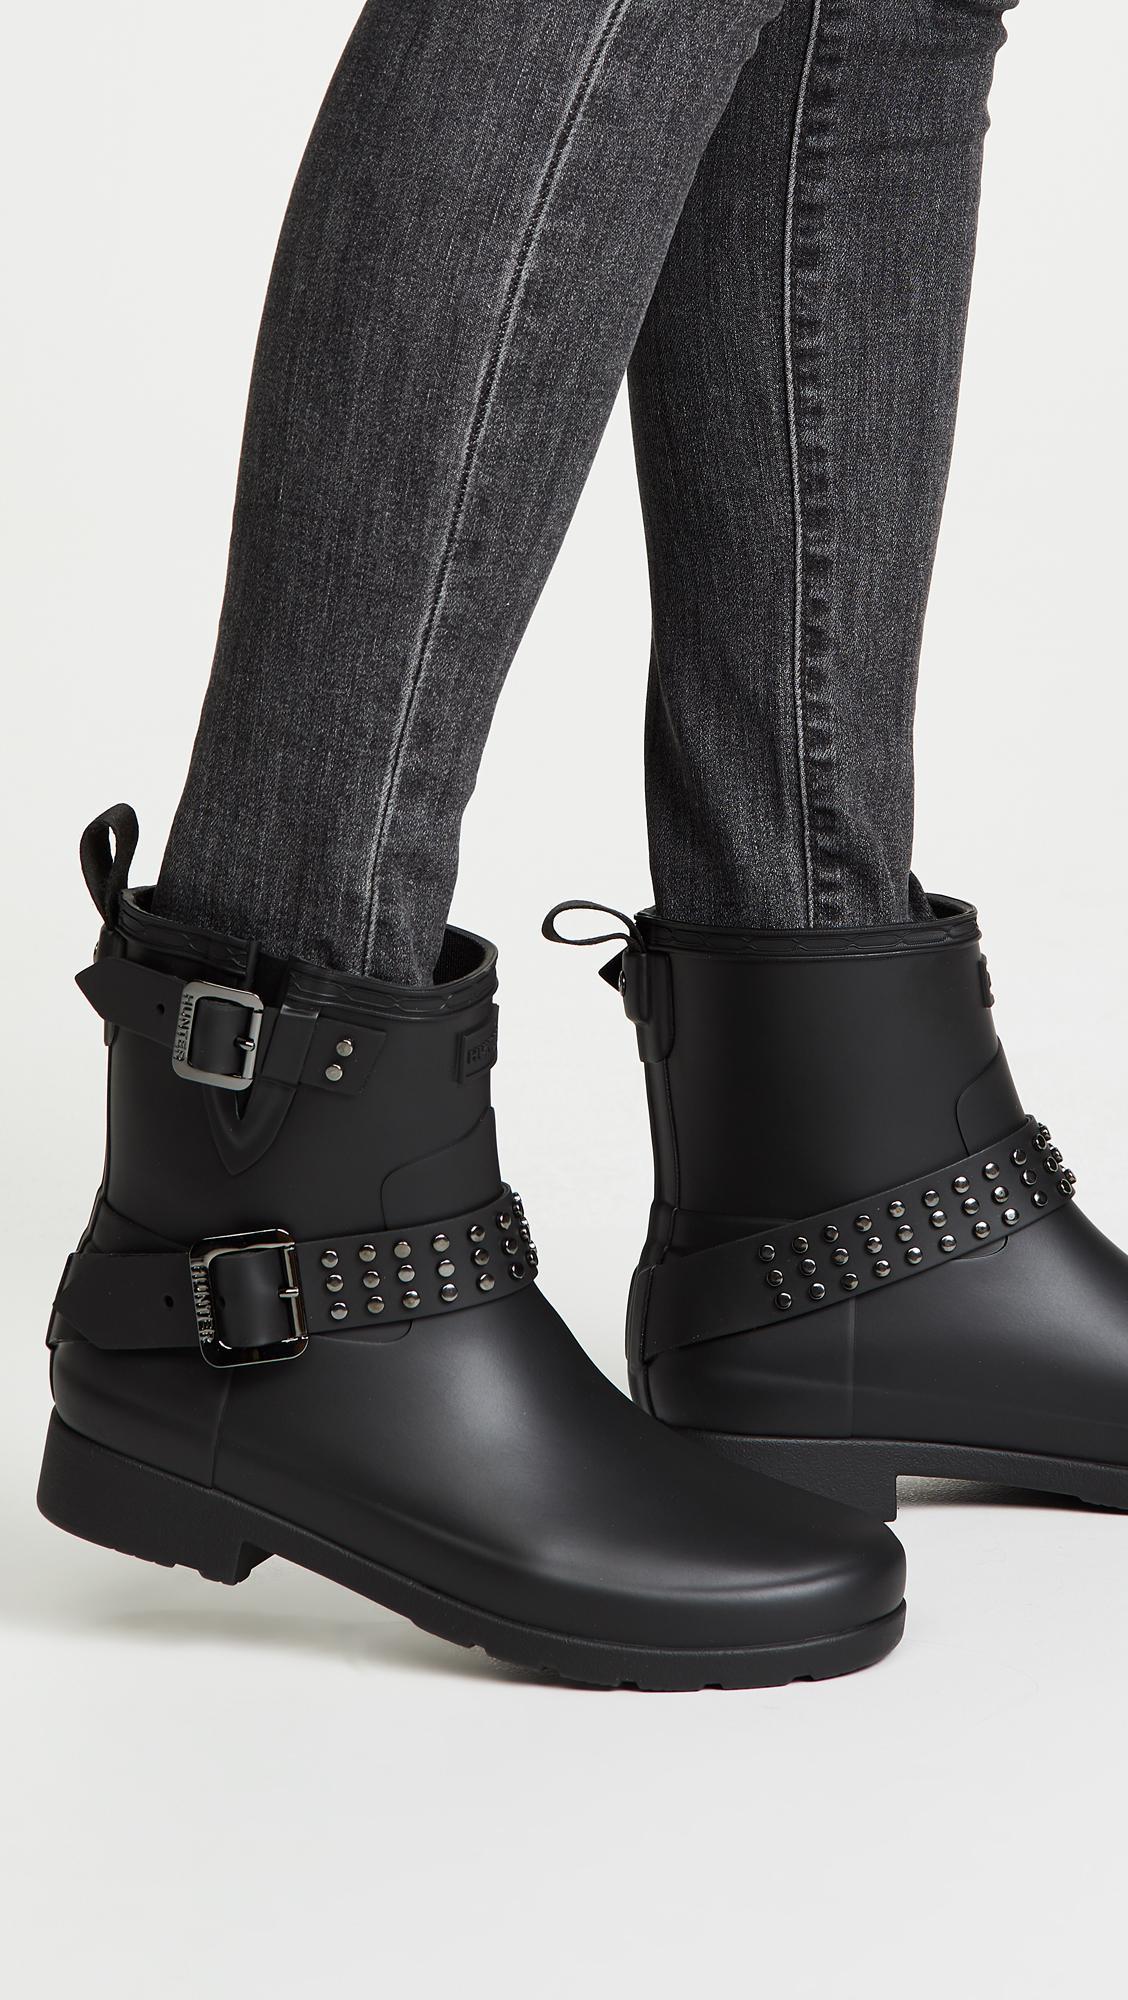 ce1dad37a68 HUNTER Refined Stud Biker Boots in Black - Lyst